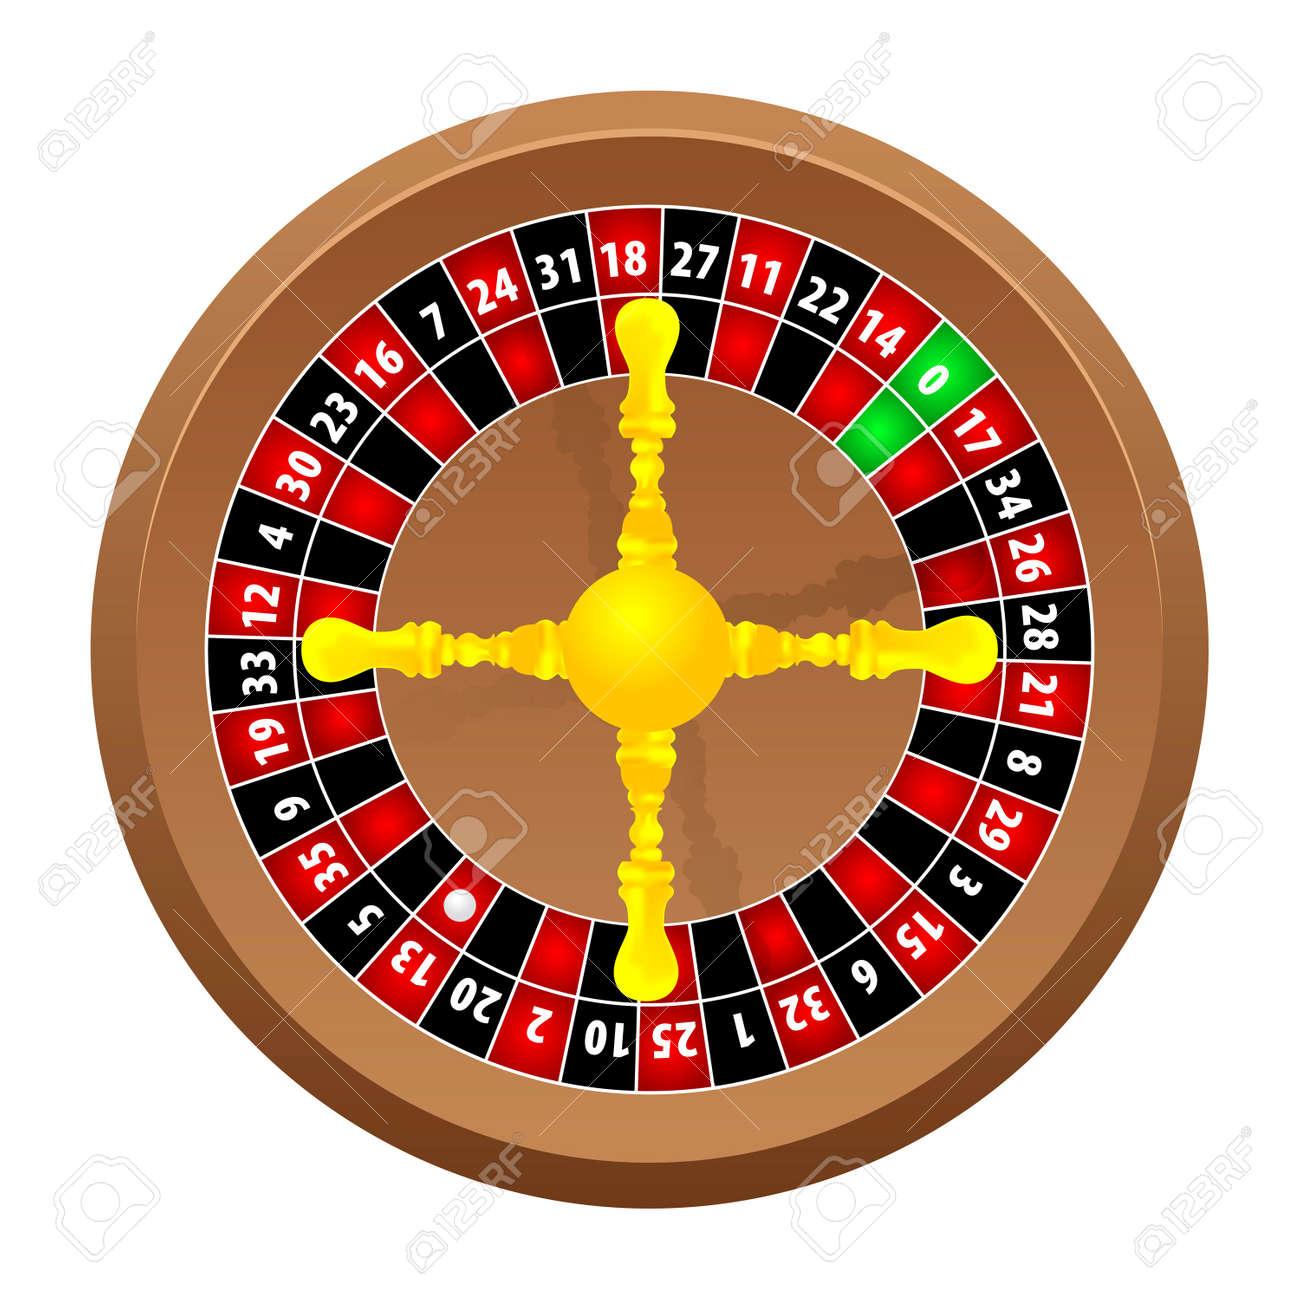 roulette casino Stock Vector - 8885790